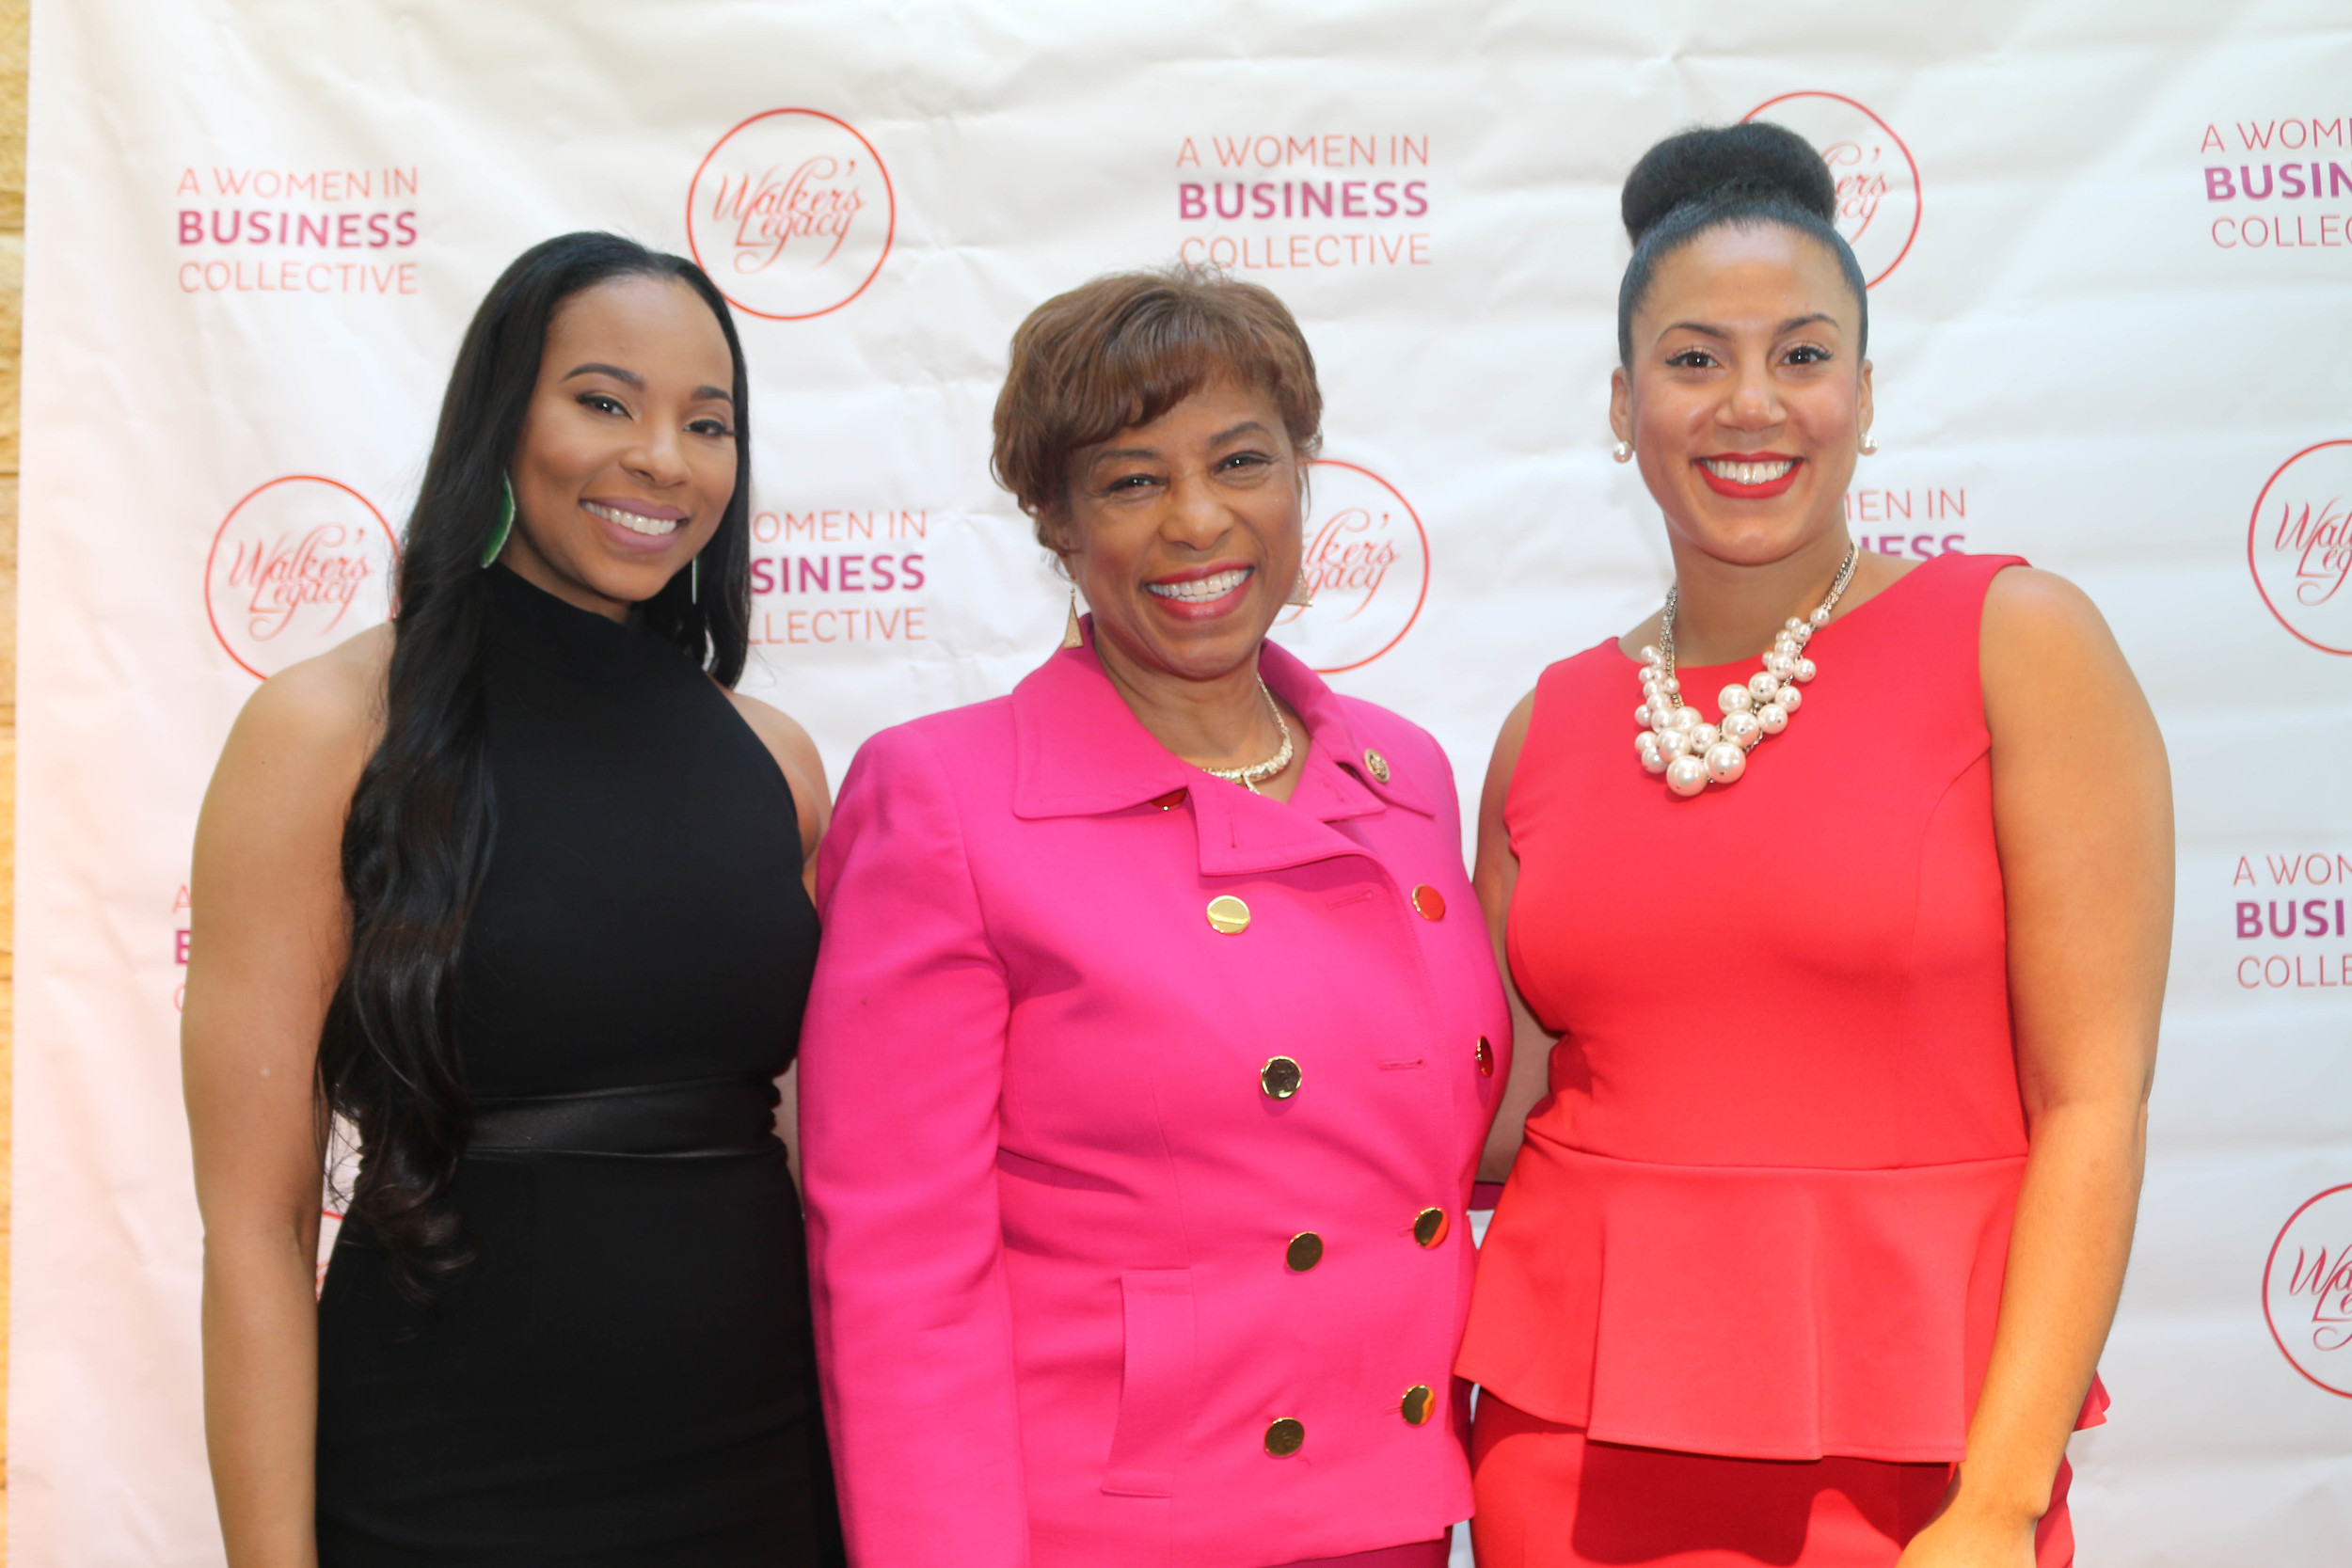 Anistia Phiartia- Detroit Chair Walker's Legacy, Congresswoman Brenda Lawrence, Natalie M.Cofield Founder Walker's Legacy.